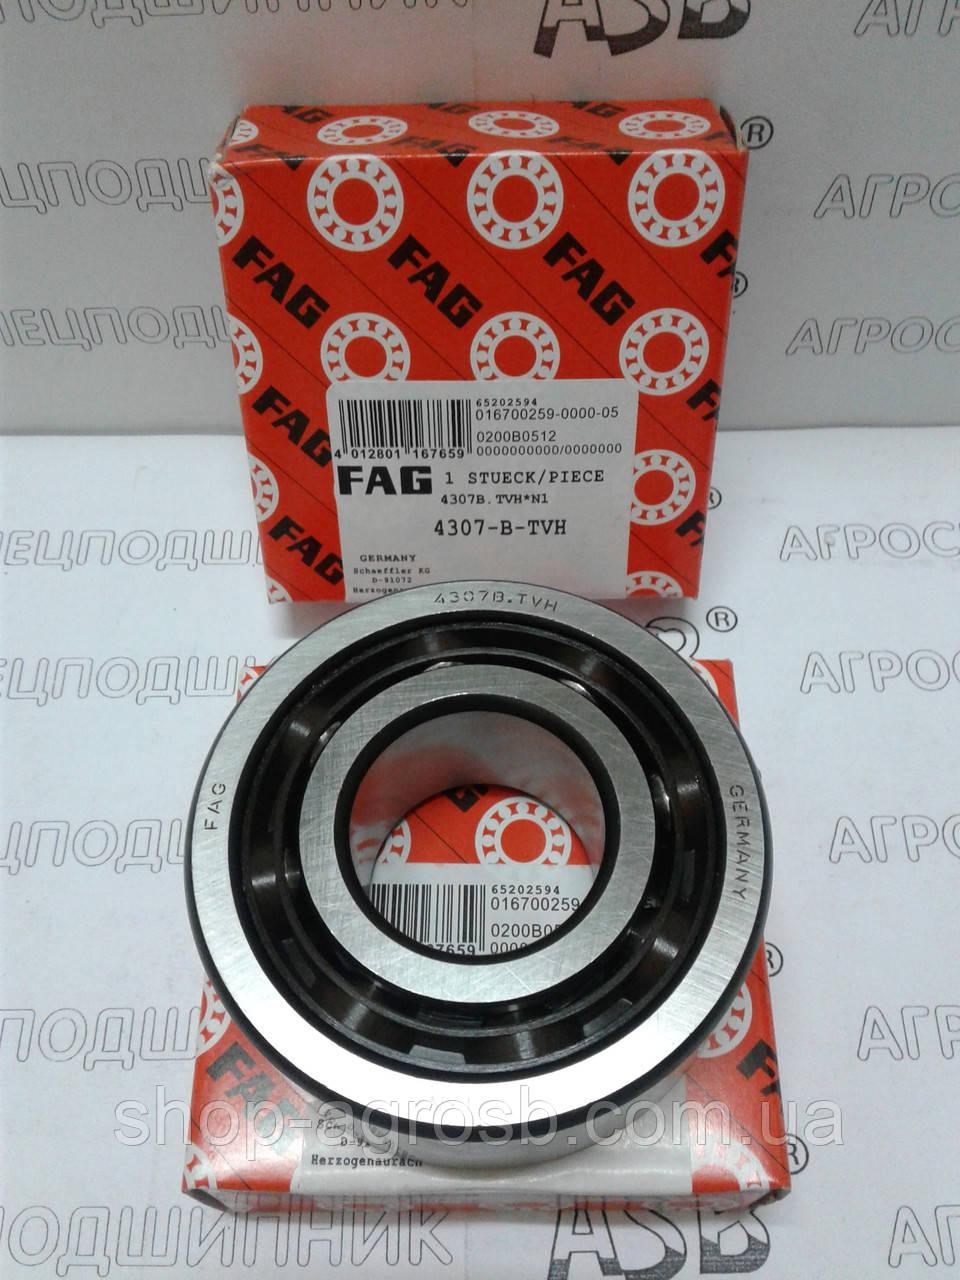 Підшипник FAG 4307-B-TVH